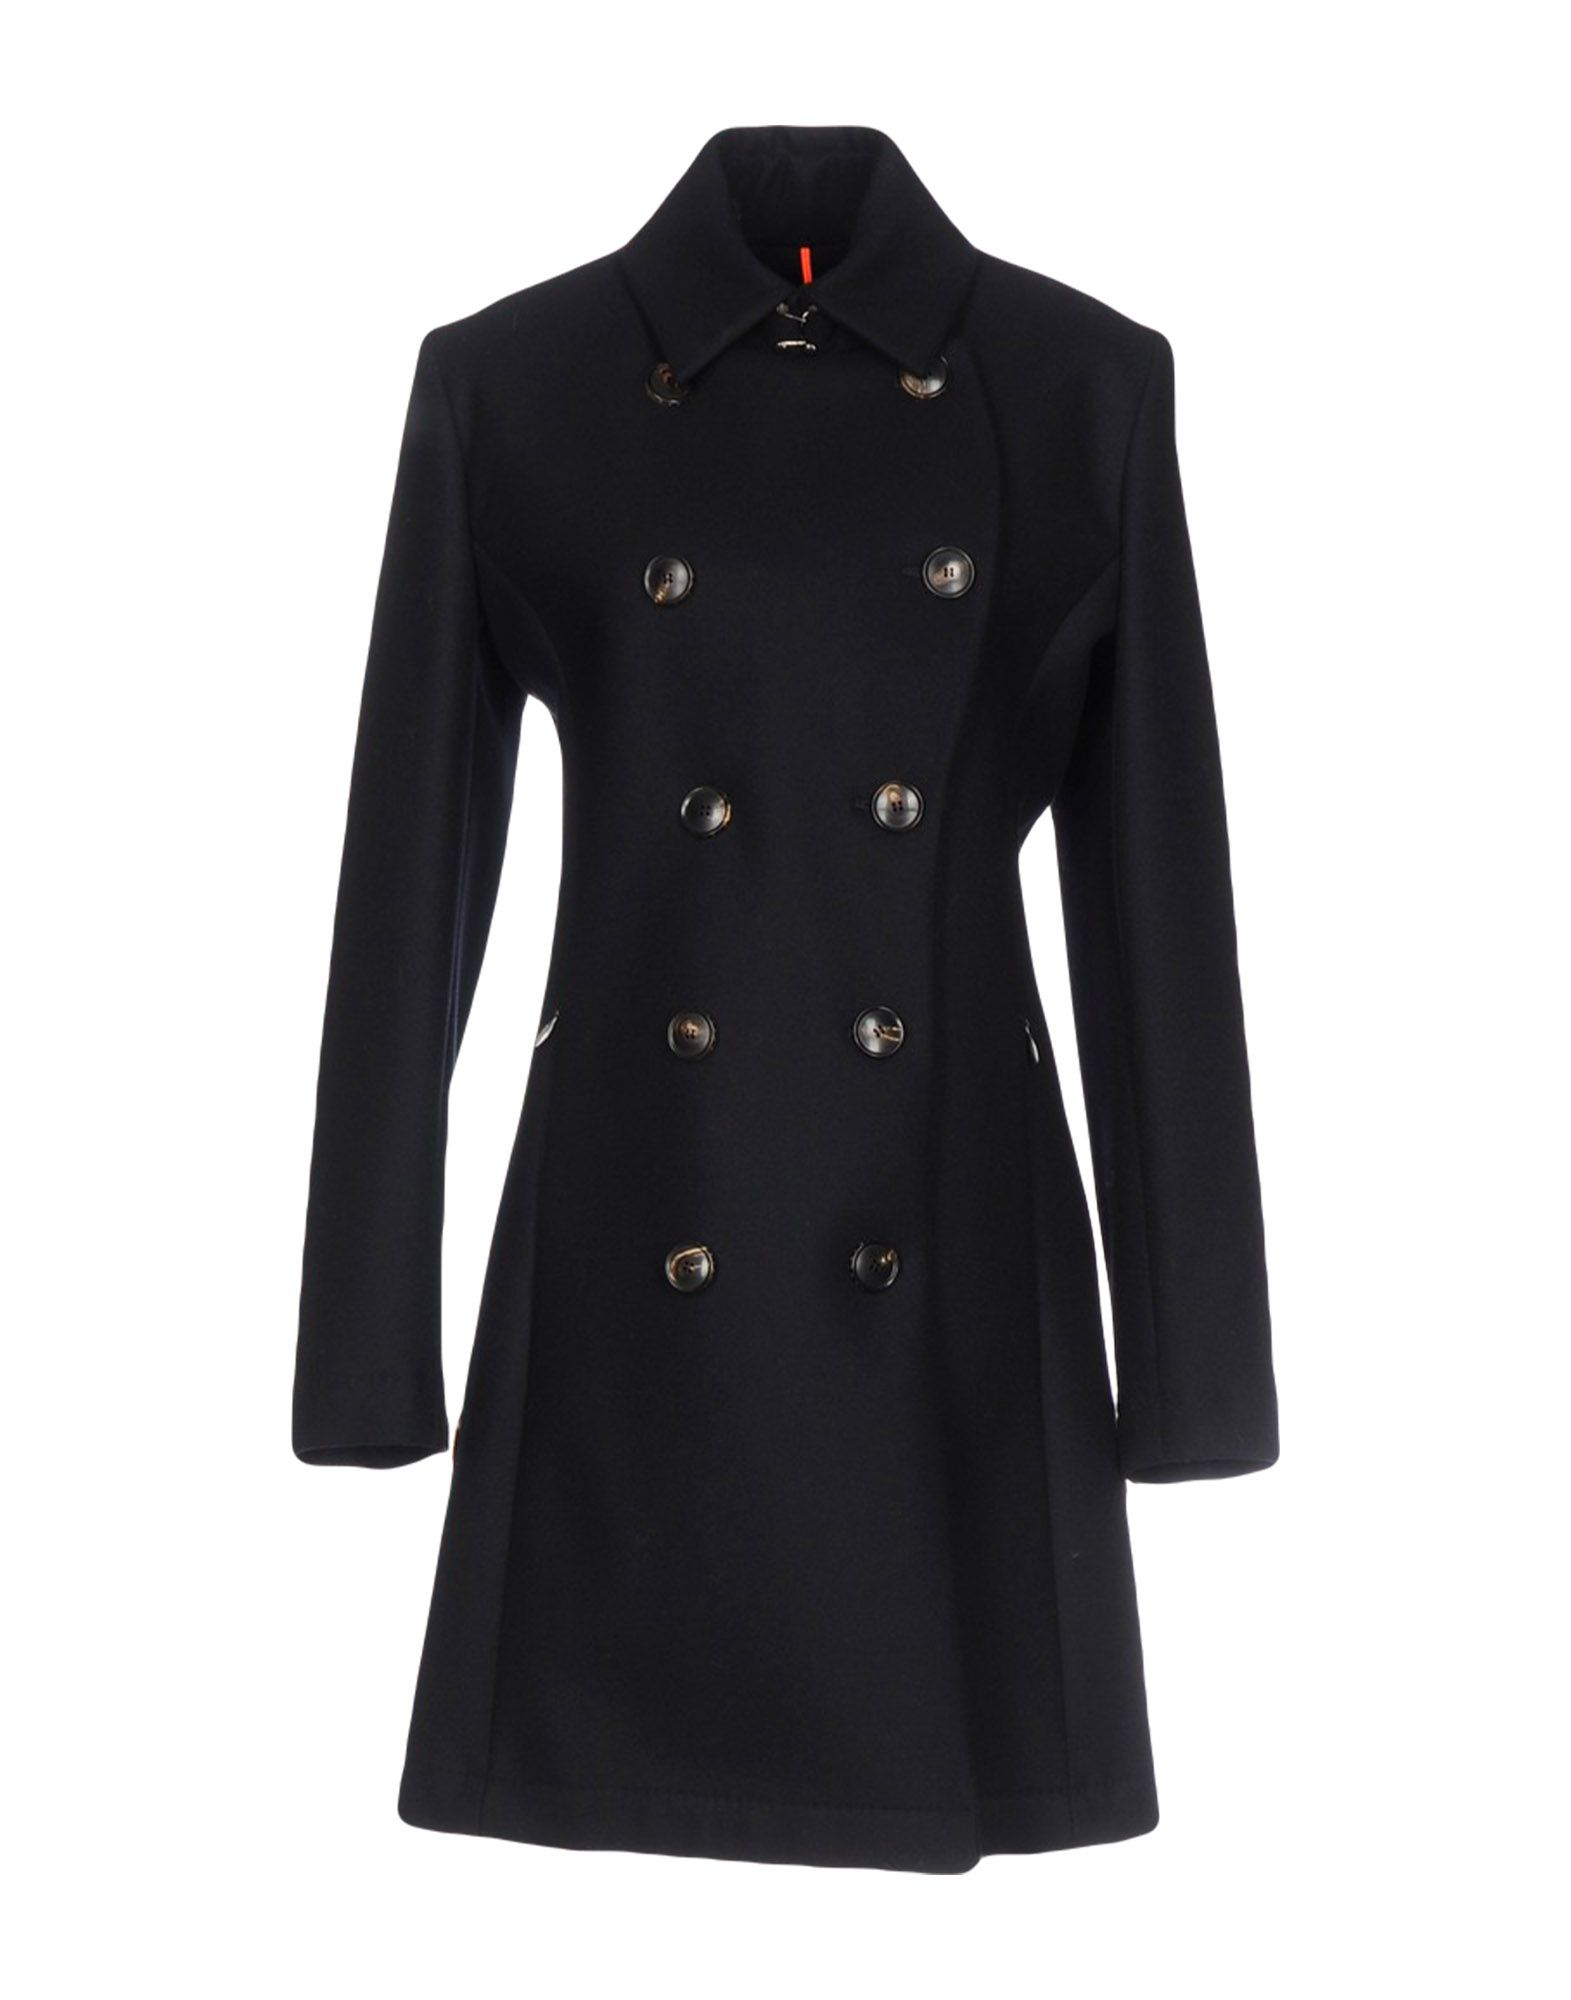 RRD Damen Mantel Farbe Schwarz Größe 6